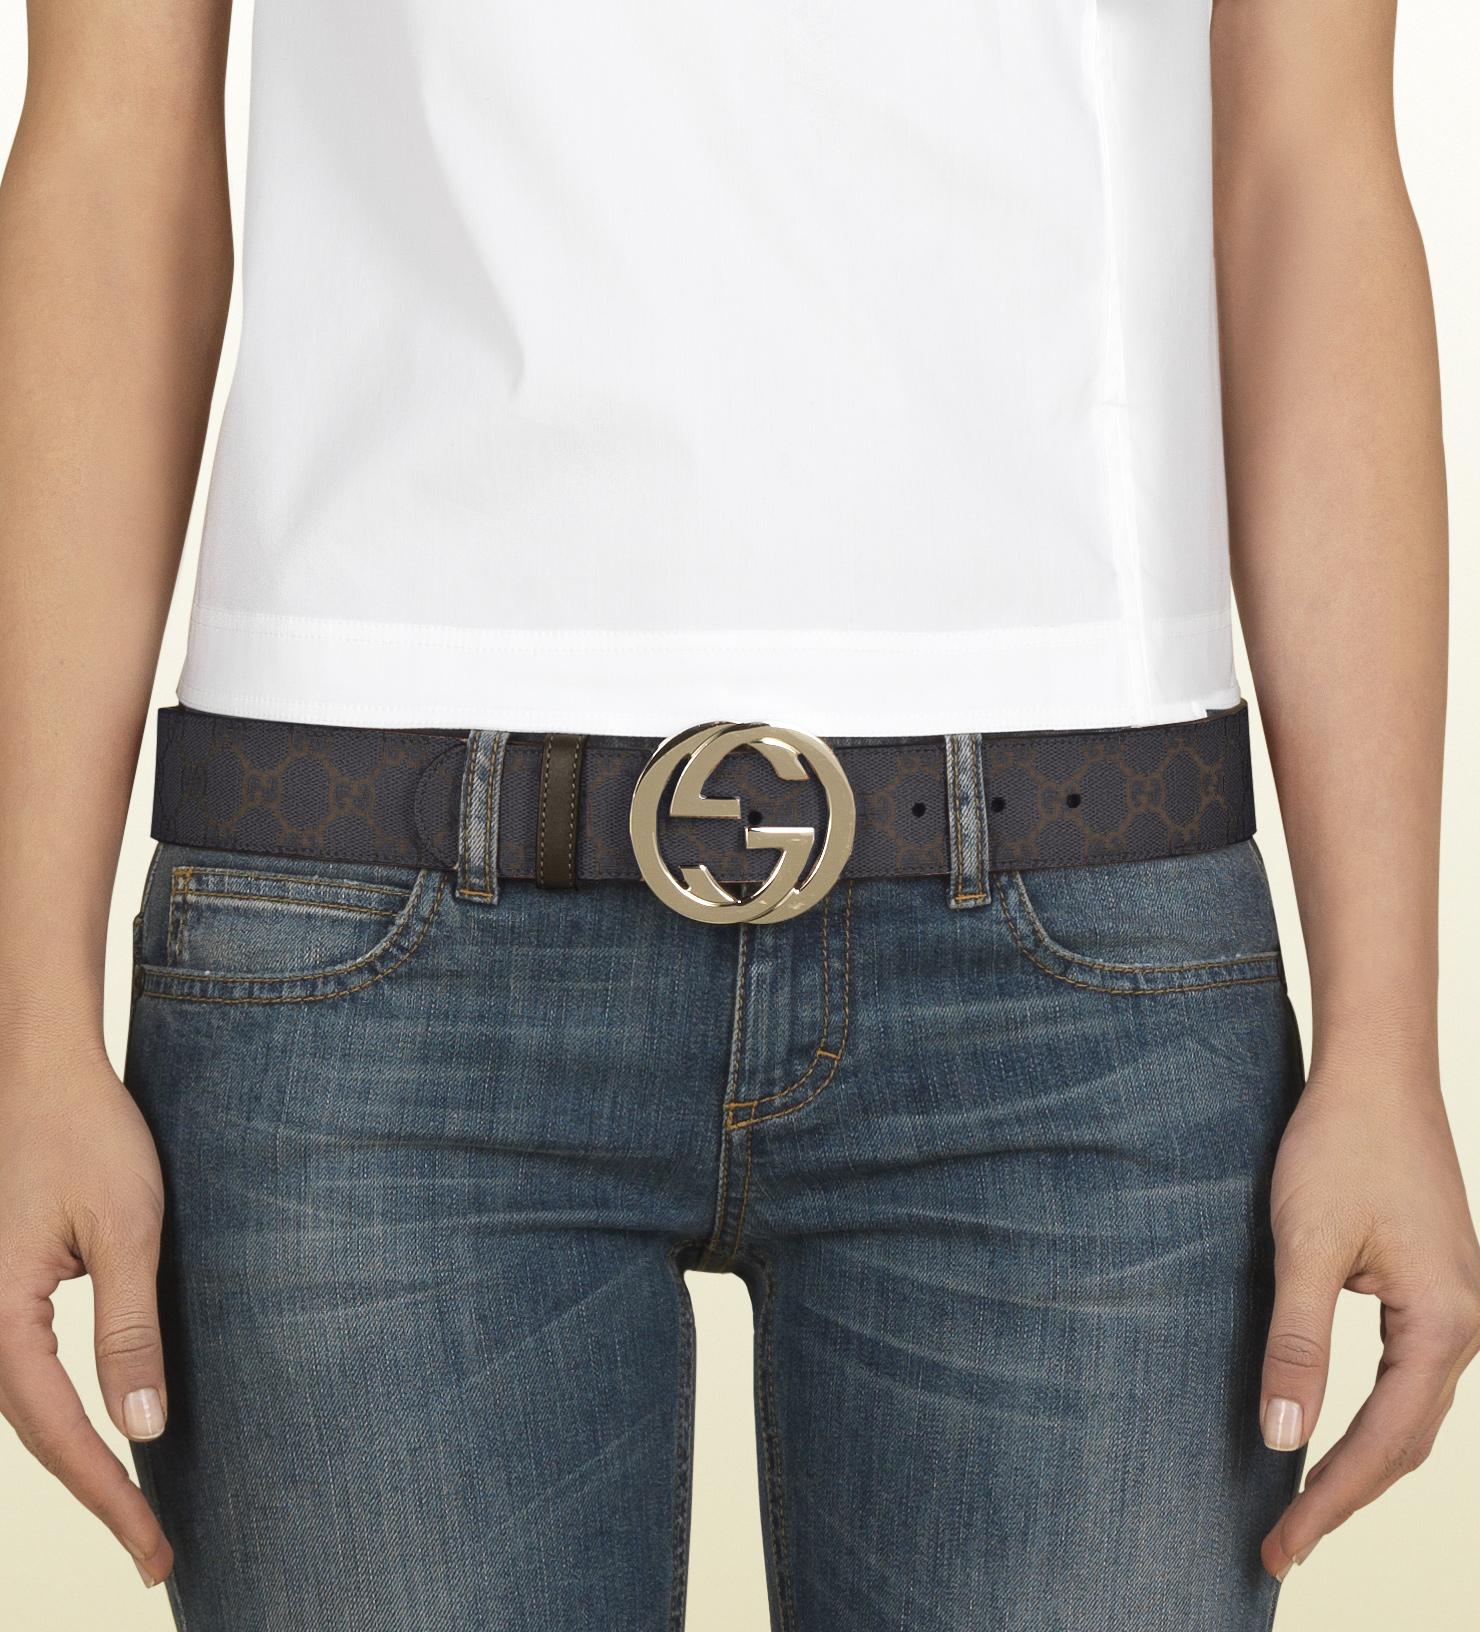 Real Ferragamo Belt >> Lyst - Gucci Gg Supreme Canvas Belt with Interlocking G Buckle in Black for Men